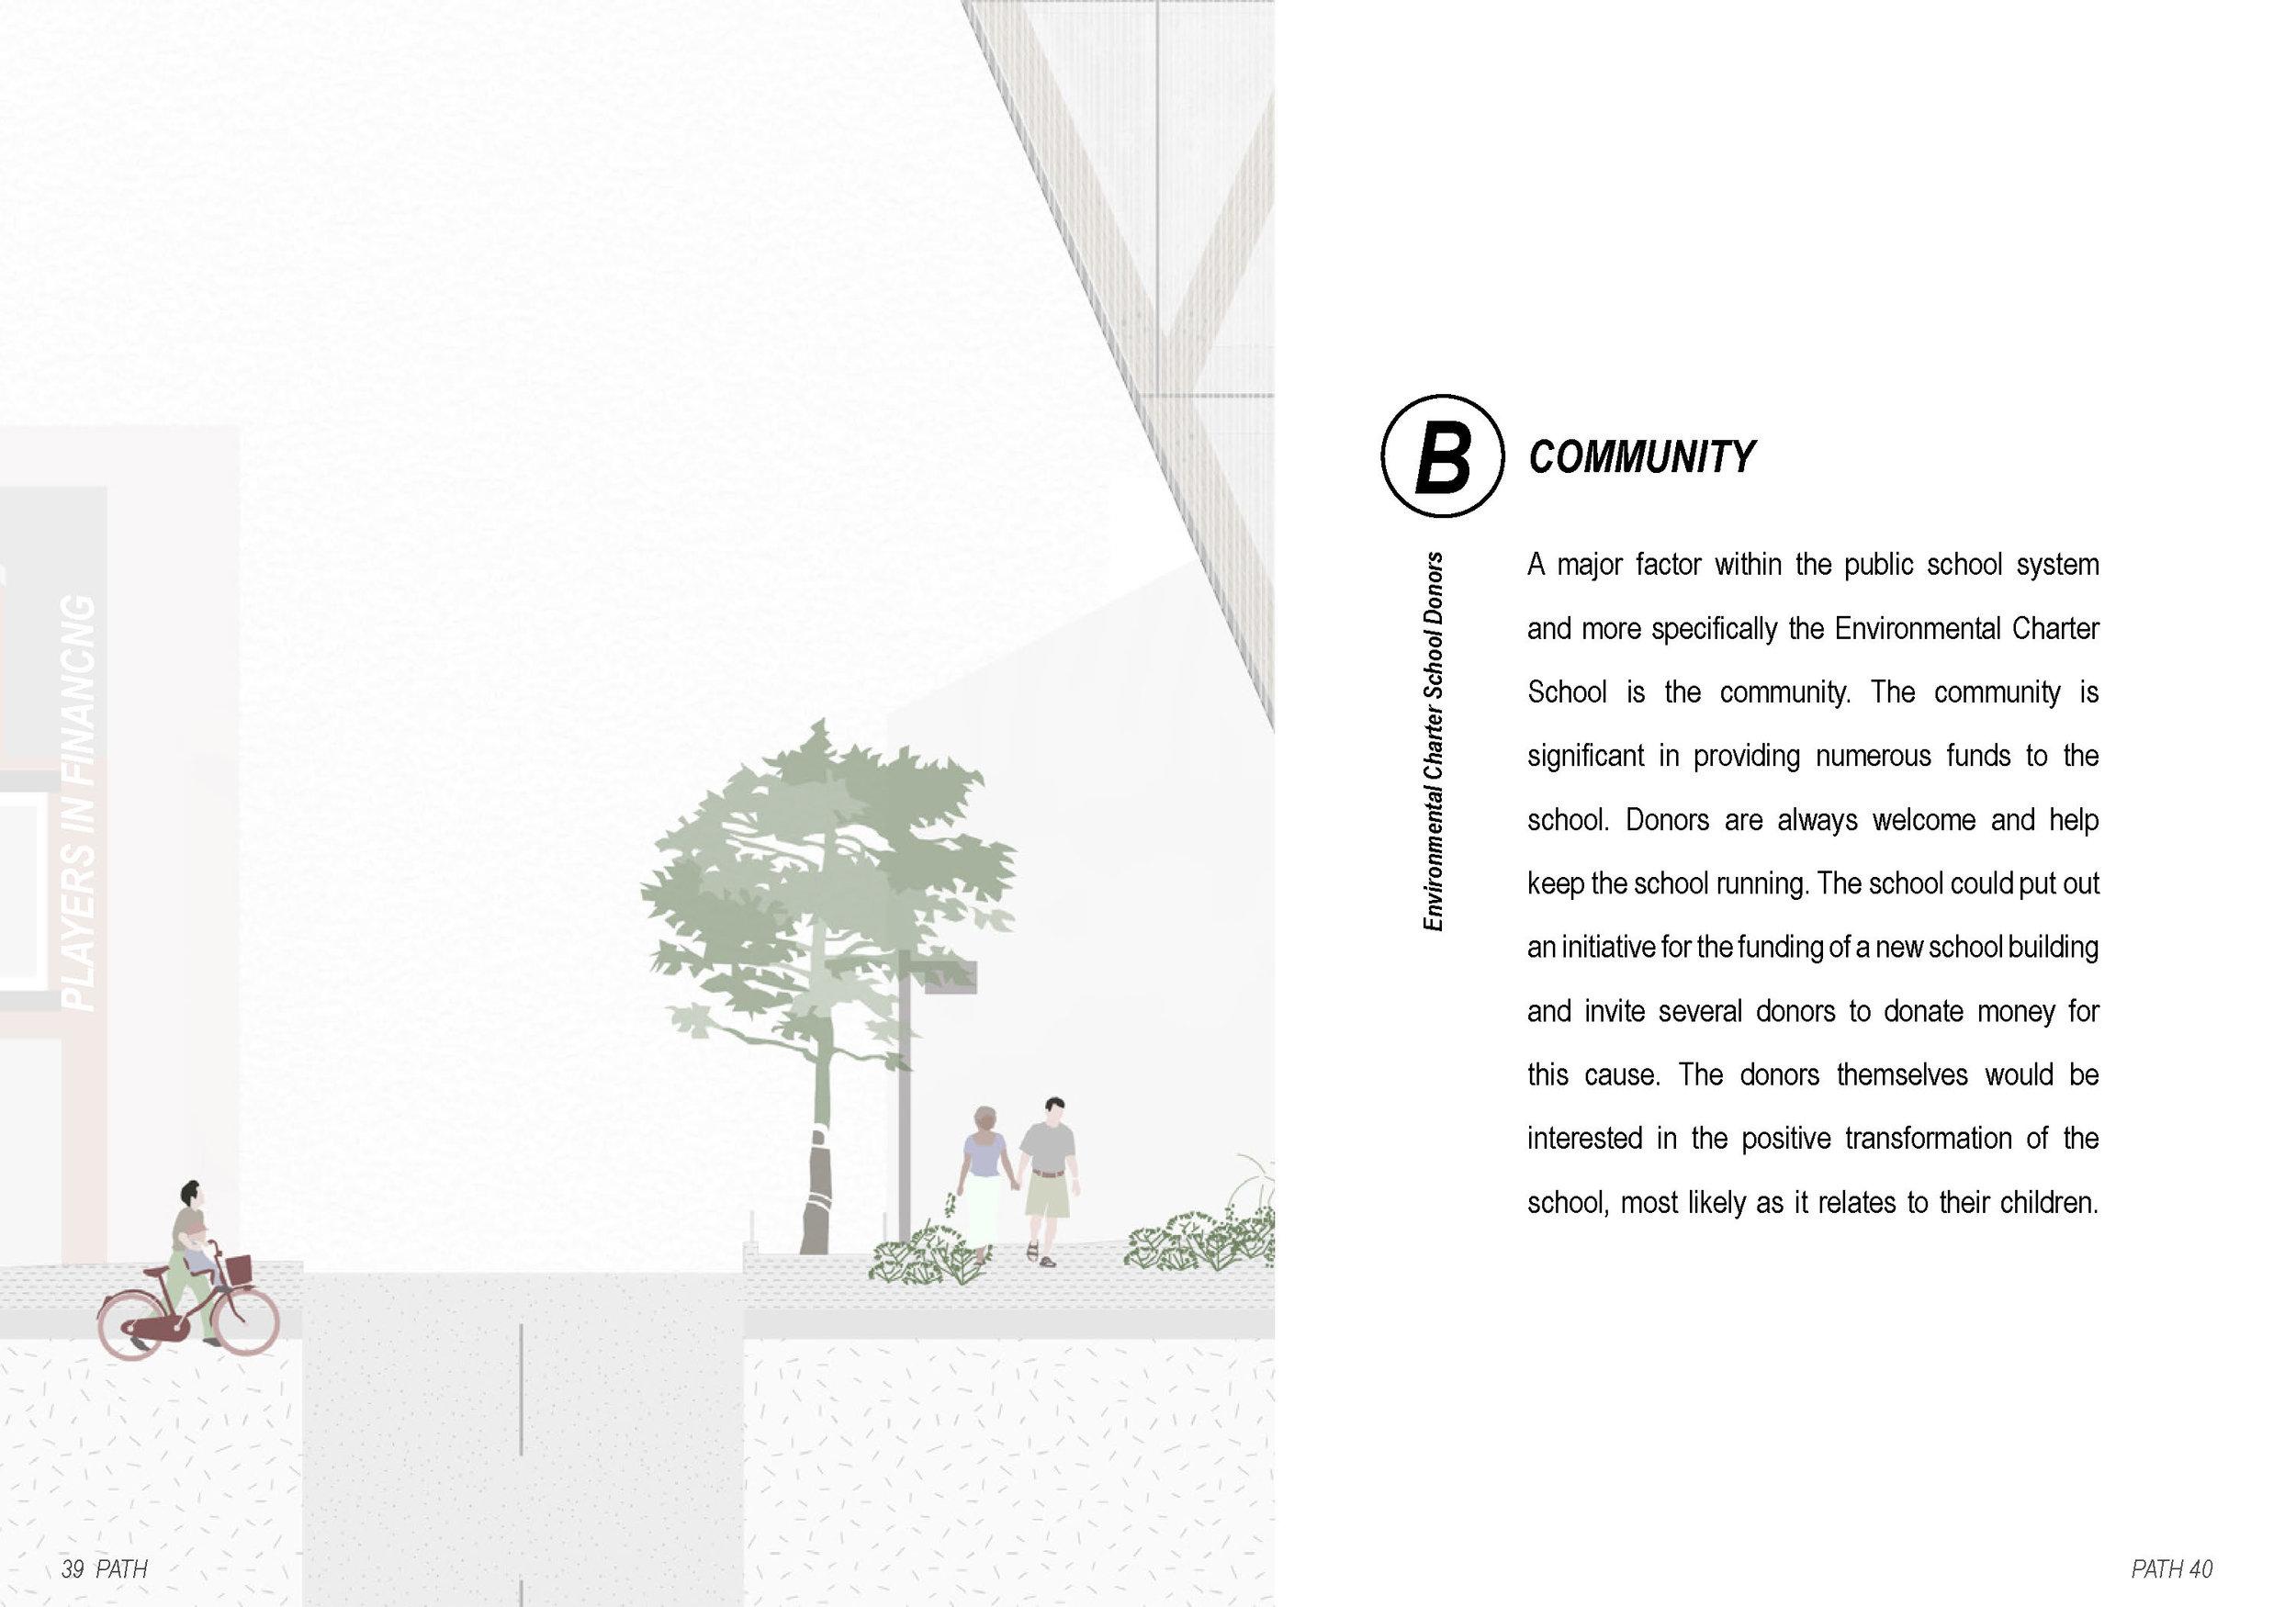 48-381_POSITION_TKHALIFA_V02_2017_05_11_SPREADS_Page_22.jpg